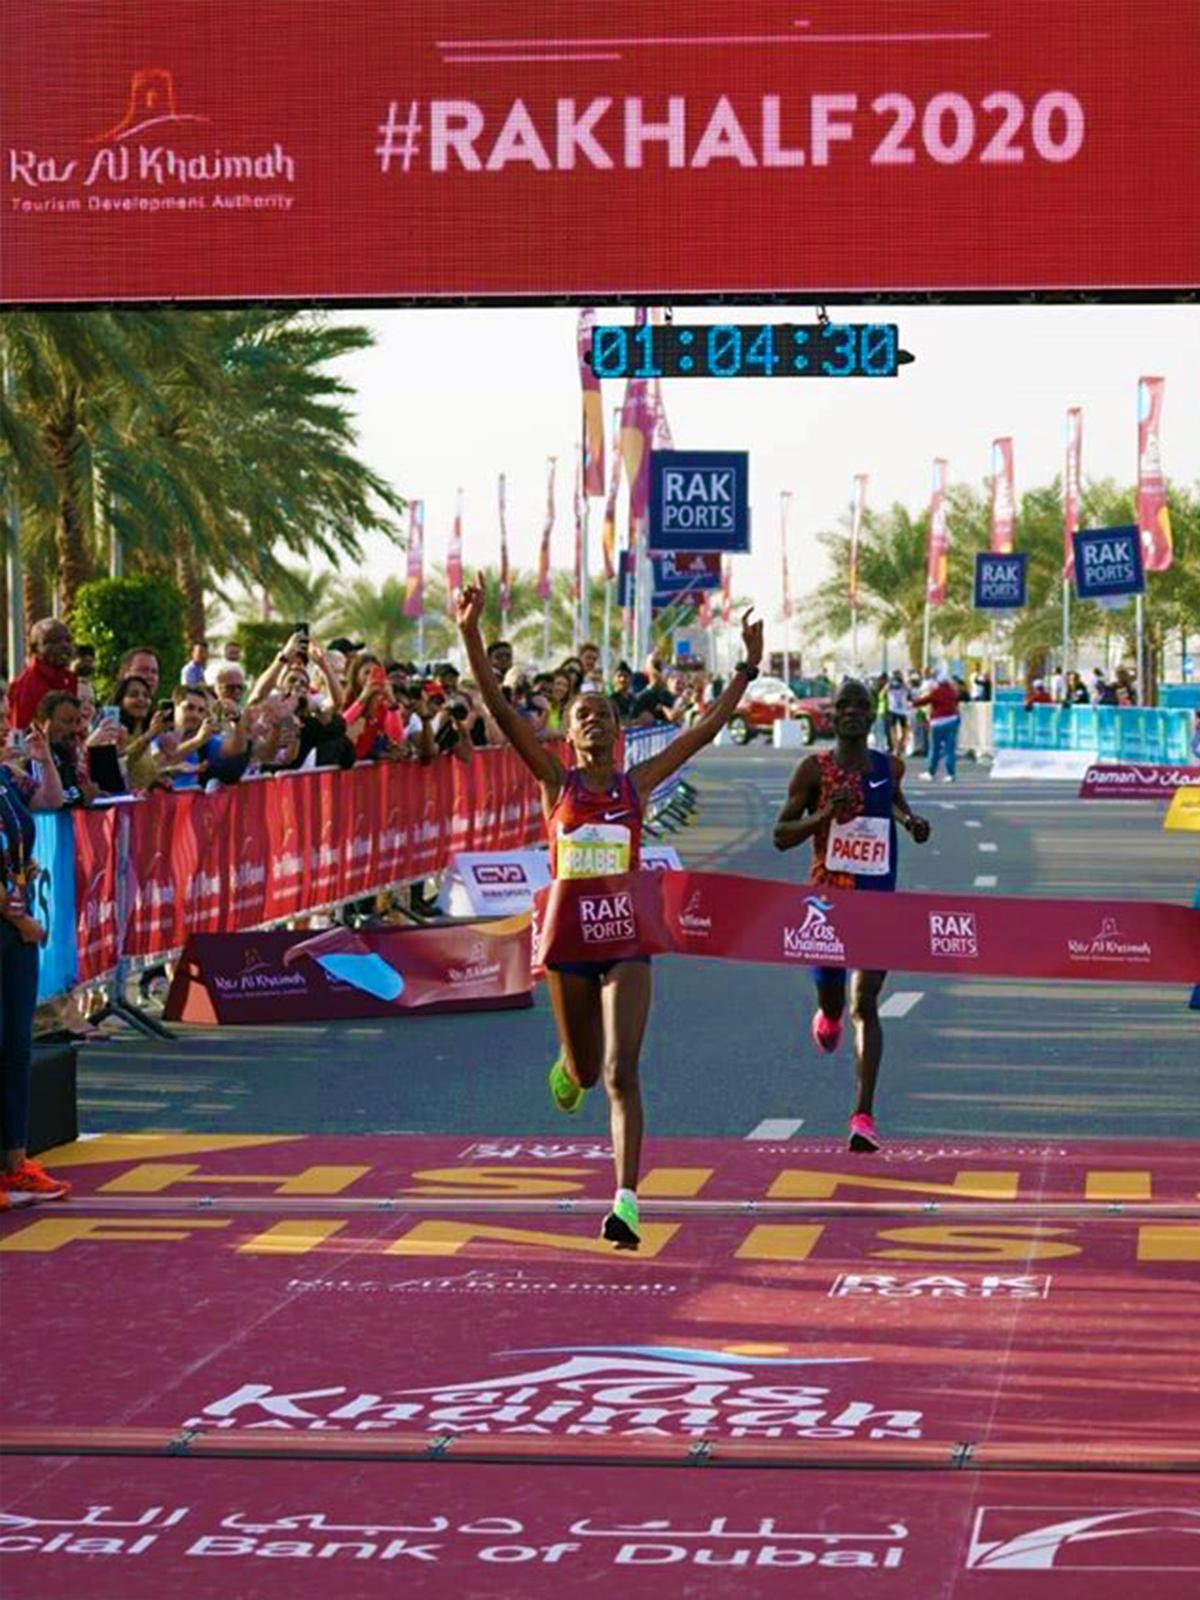 rak-half-marathon-rosa-associati-world-record-ababel-yeshaneh-3